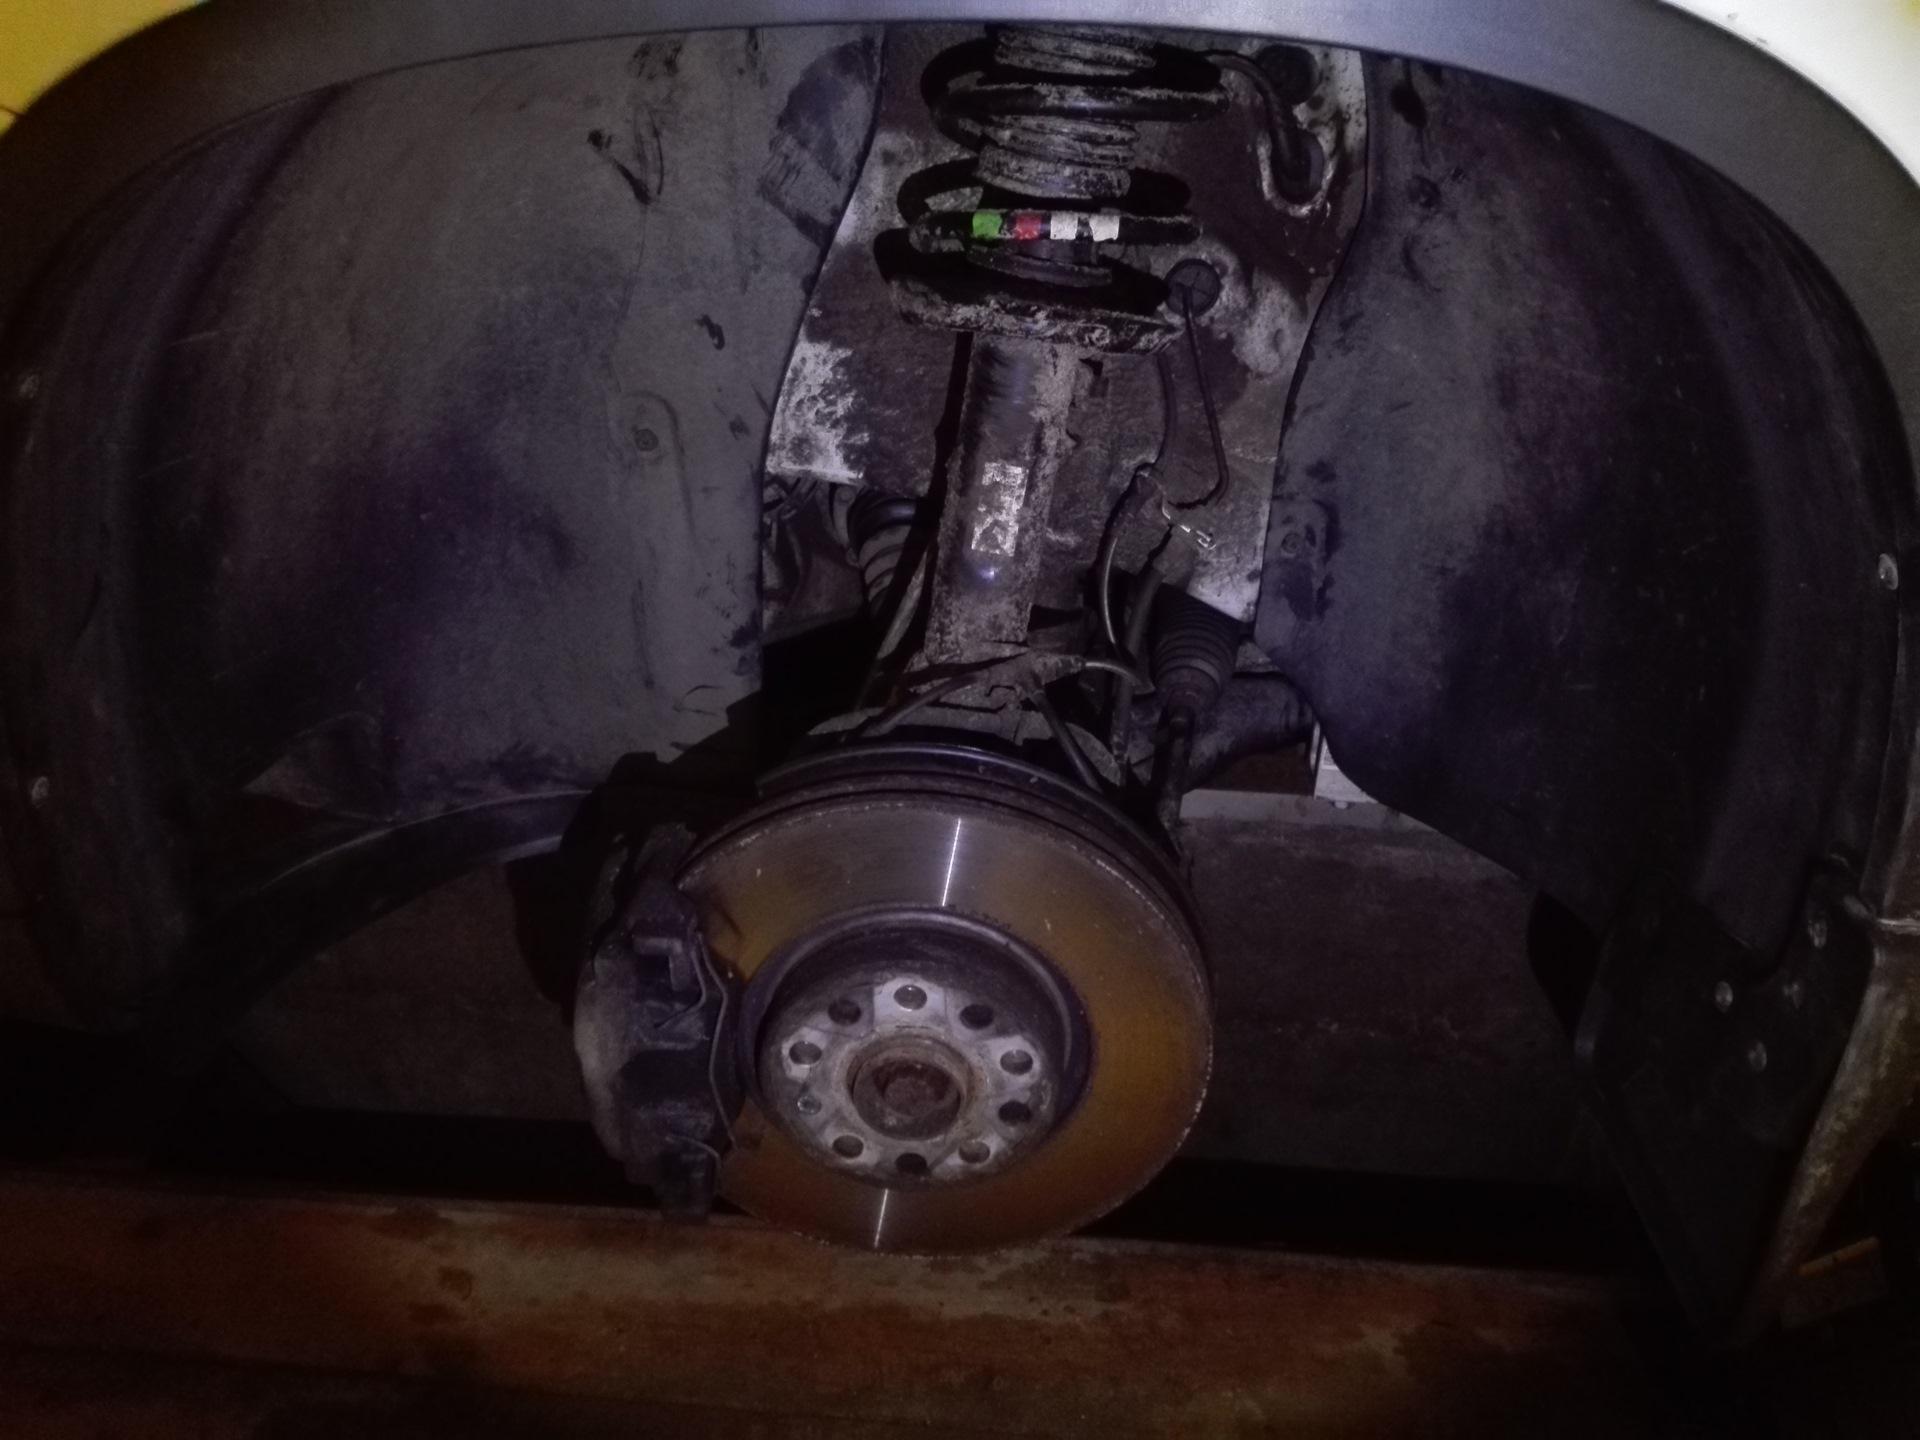 Замена моторчика омывателя фольксваген тигуан Замена передней балки xc90